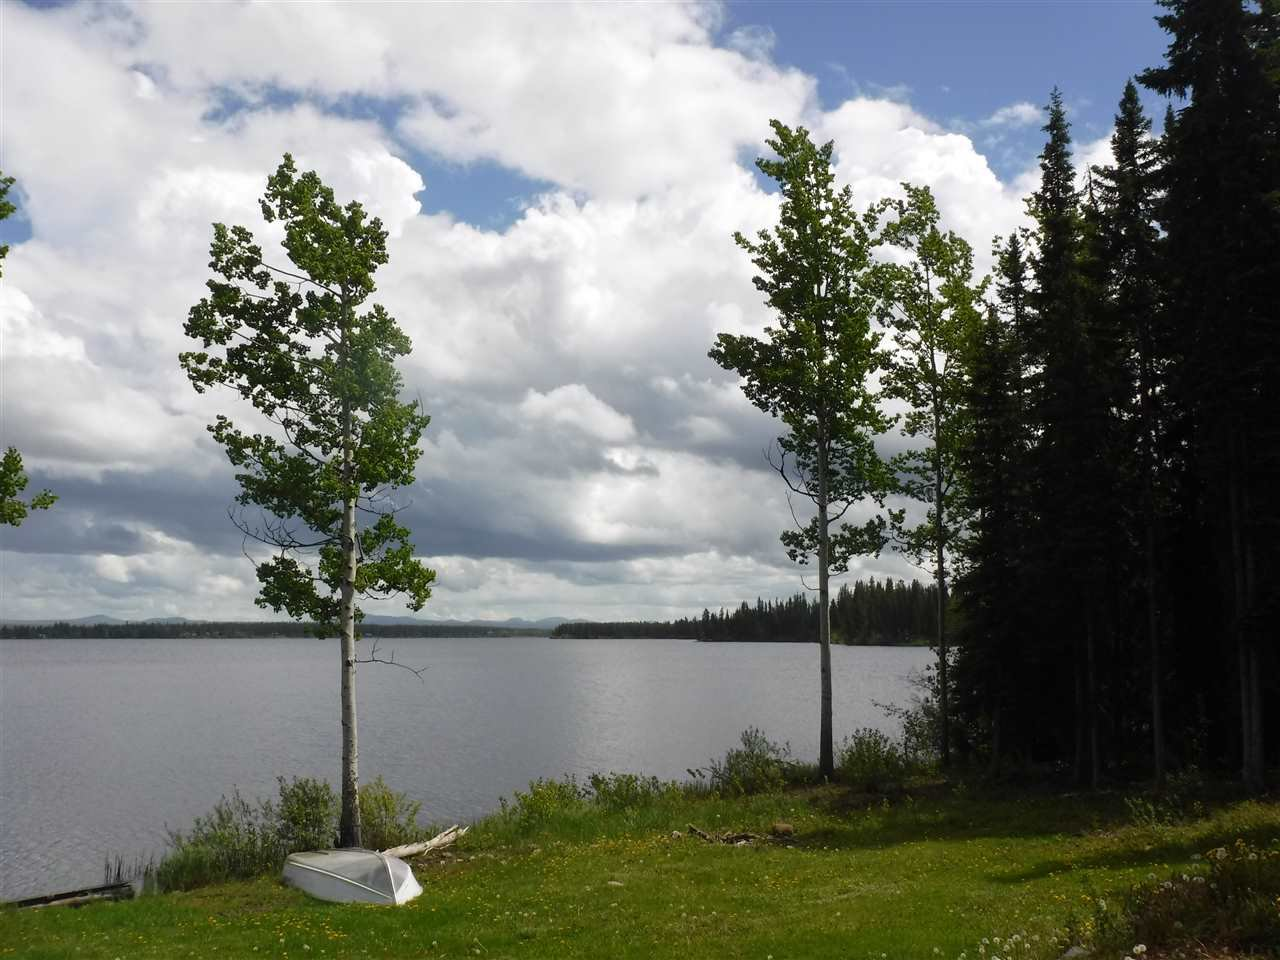 Photo 8: Photos: 3126 ELSEY Road in Williams Lake: Williams Lake - Rural West House for sale (Williams Lake (Zone 27))  : MLS®# R2467730